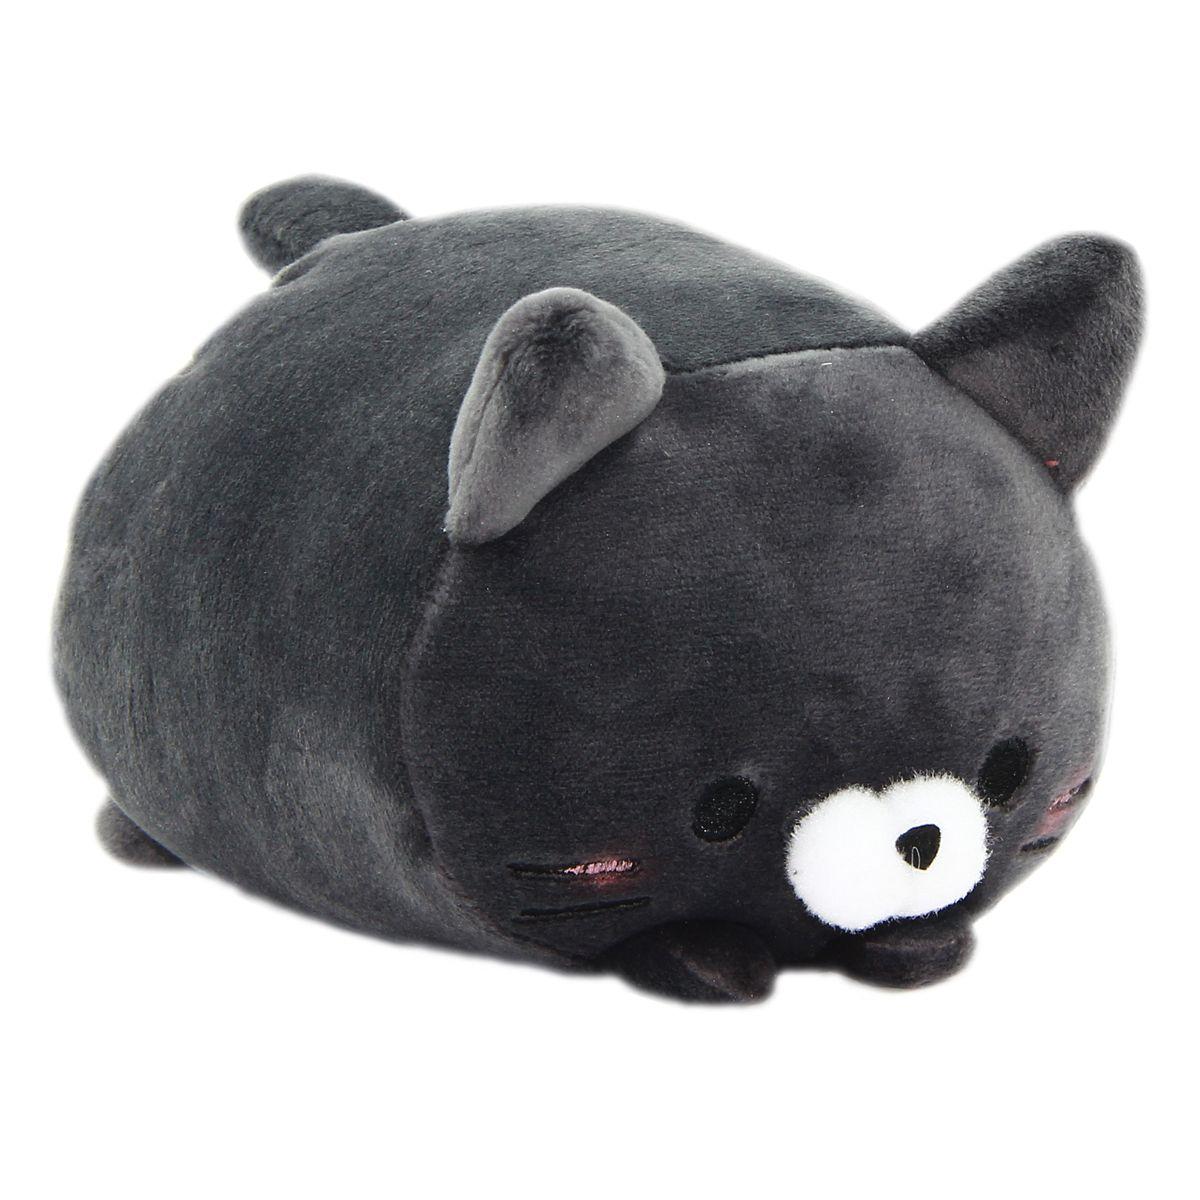 Predownload: Plush Cat Squishy Toy Super Soft Stuffed Animal Neko Black Soft Stuffed Animals Neko Cats [ 1200 x 1200 Pixel ]